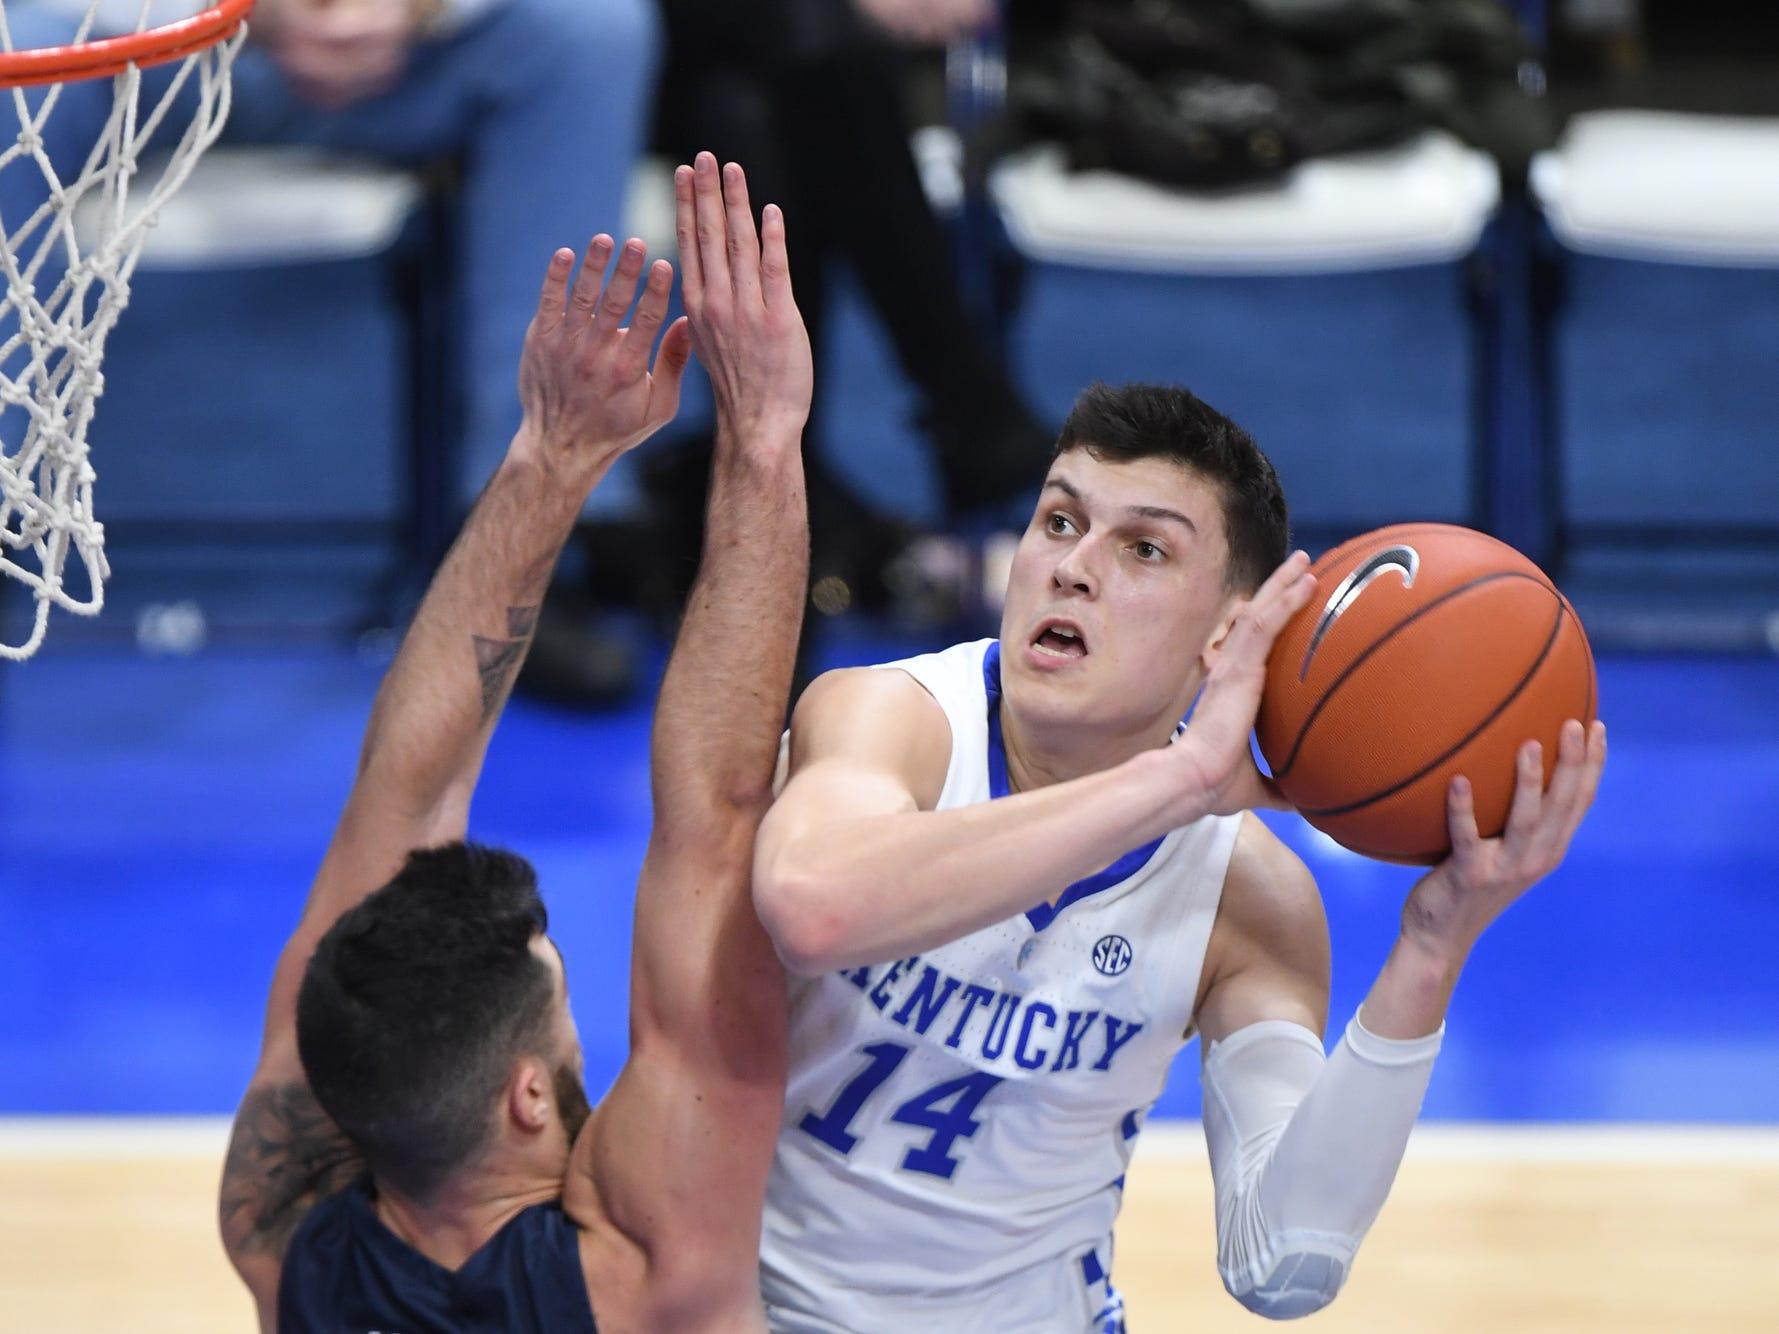 UK G Tyler Herro shoots during the University of Kentucky men's basketball game against UNC Greensboro at Rupp Arena in Lexington, Kentucky on Saturday, December 1, 2018.